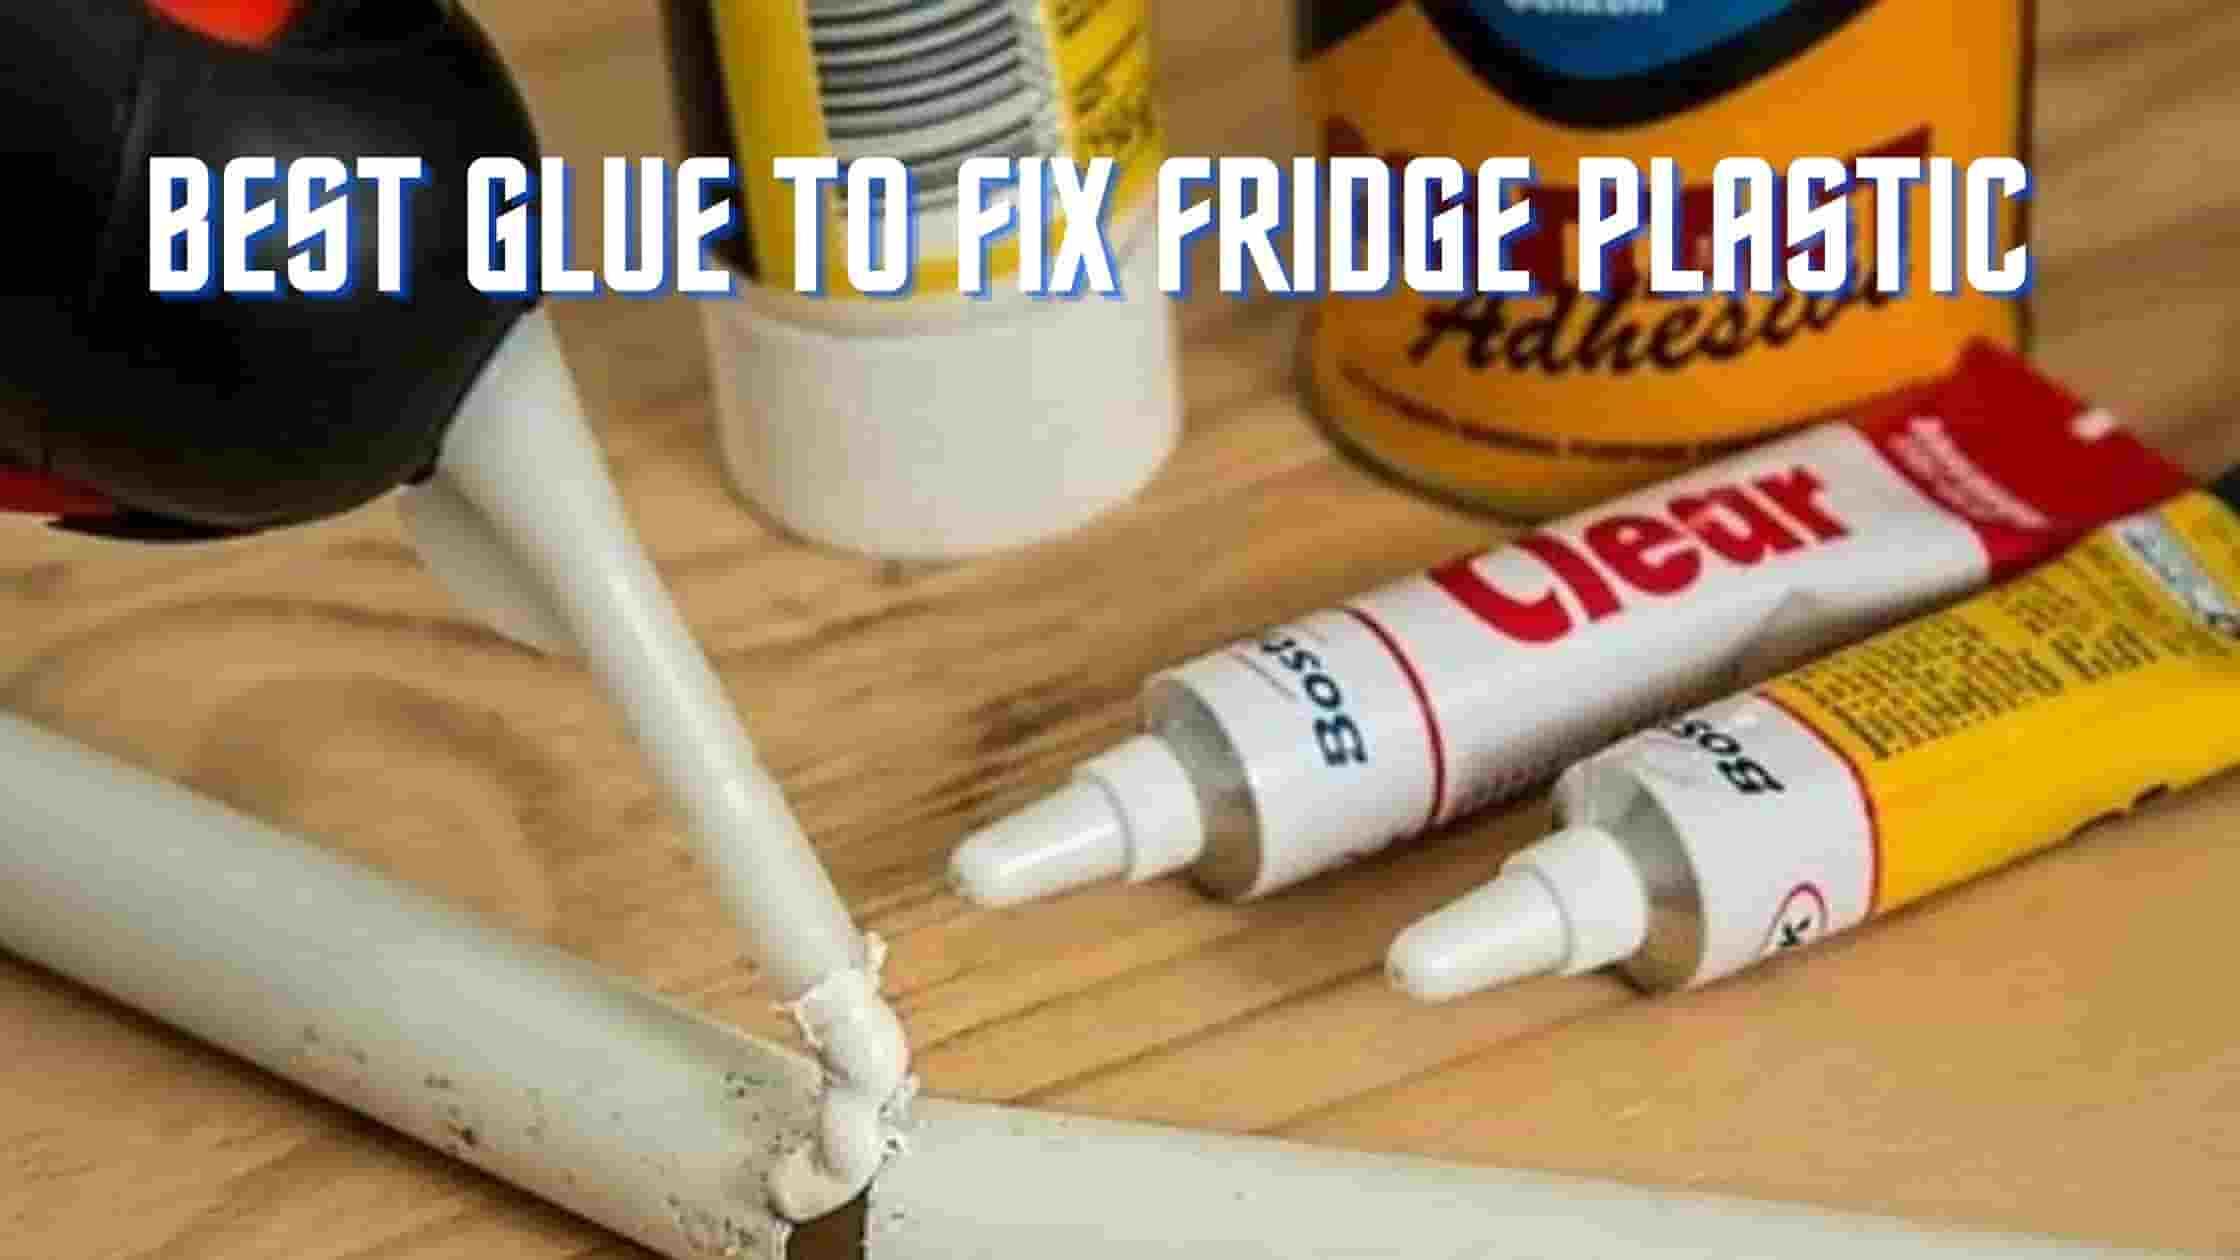 best glue to fix fridge plastic